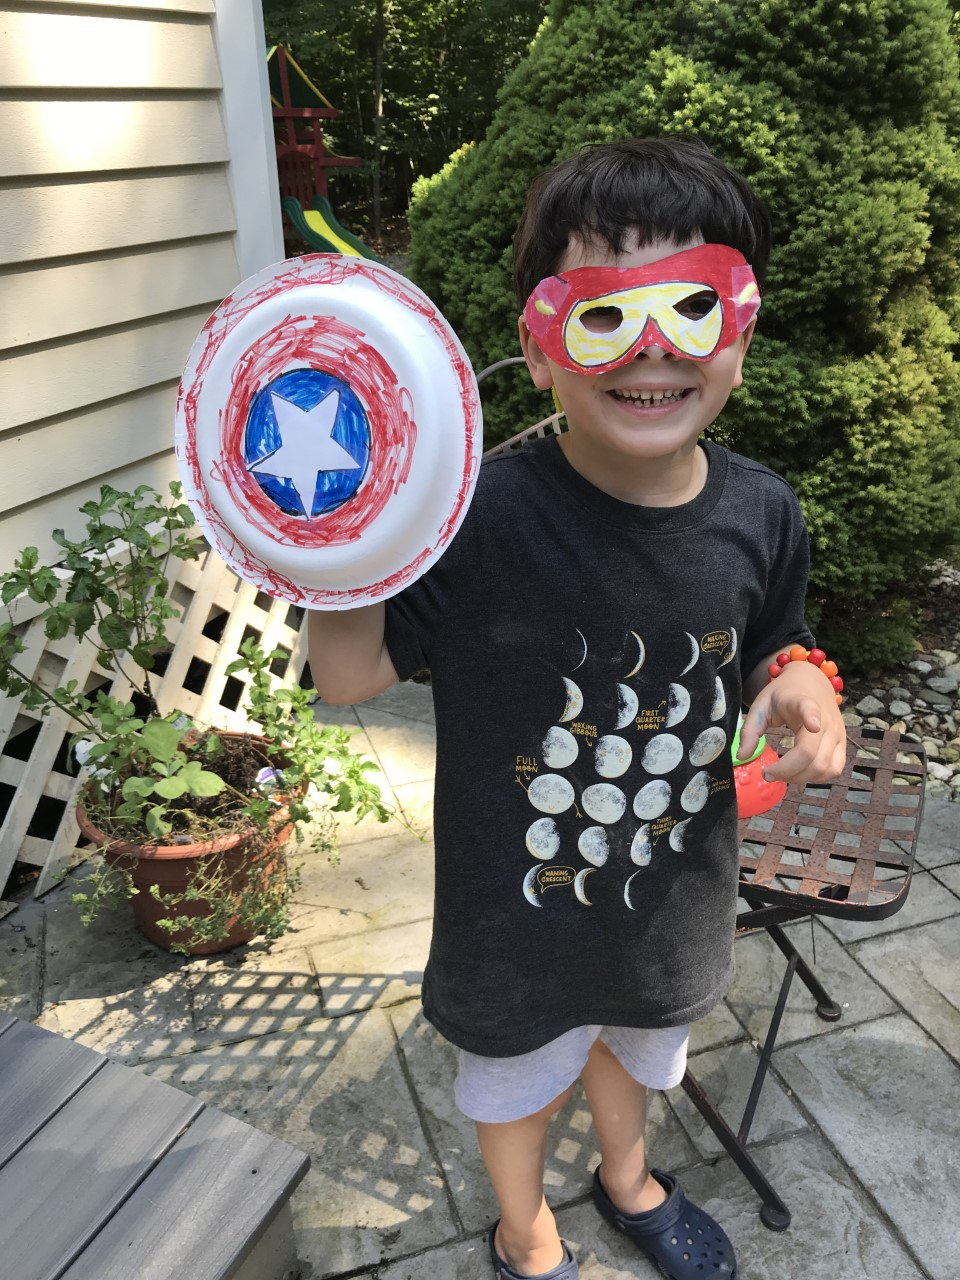 Eli really got into the superhero spirit!